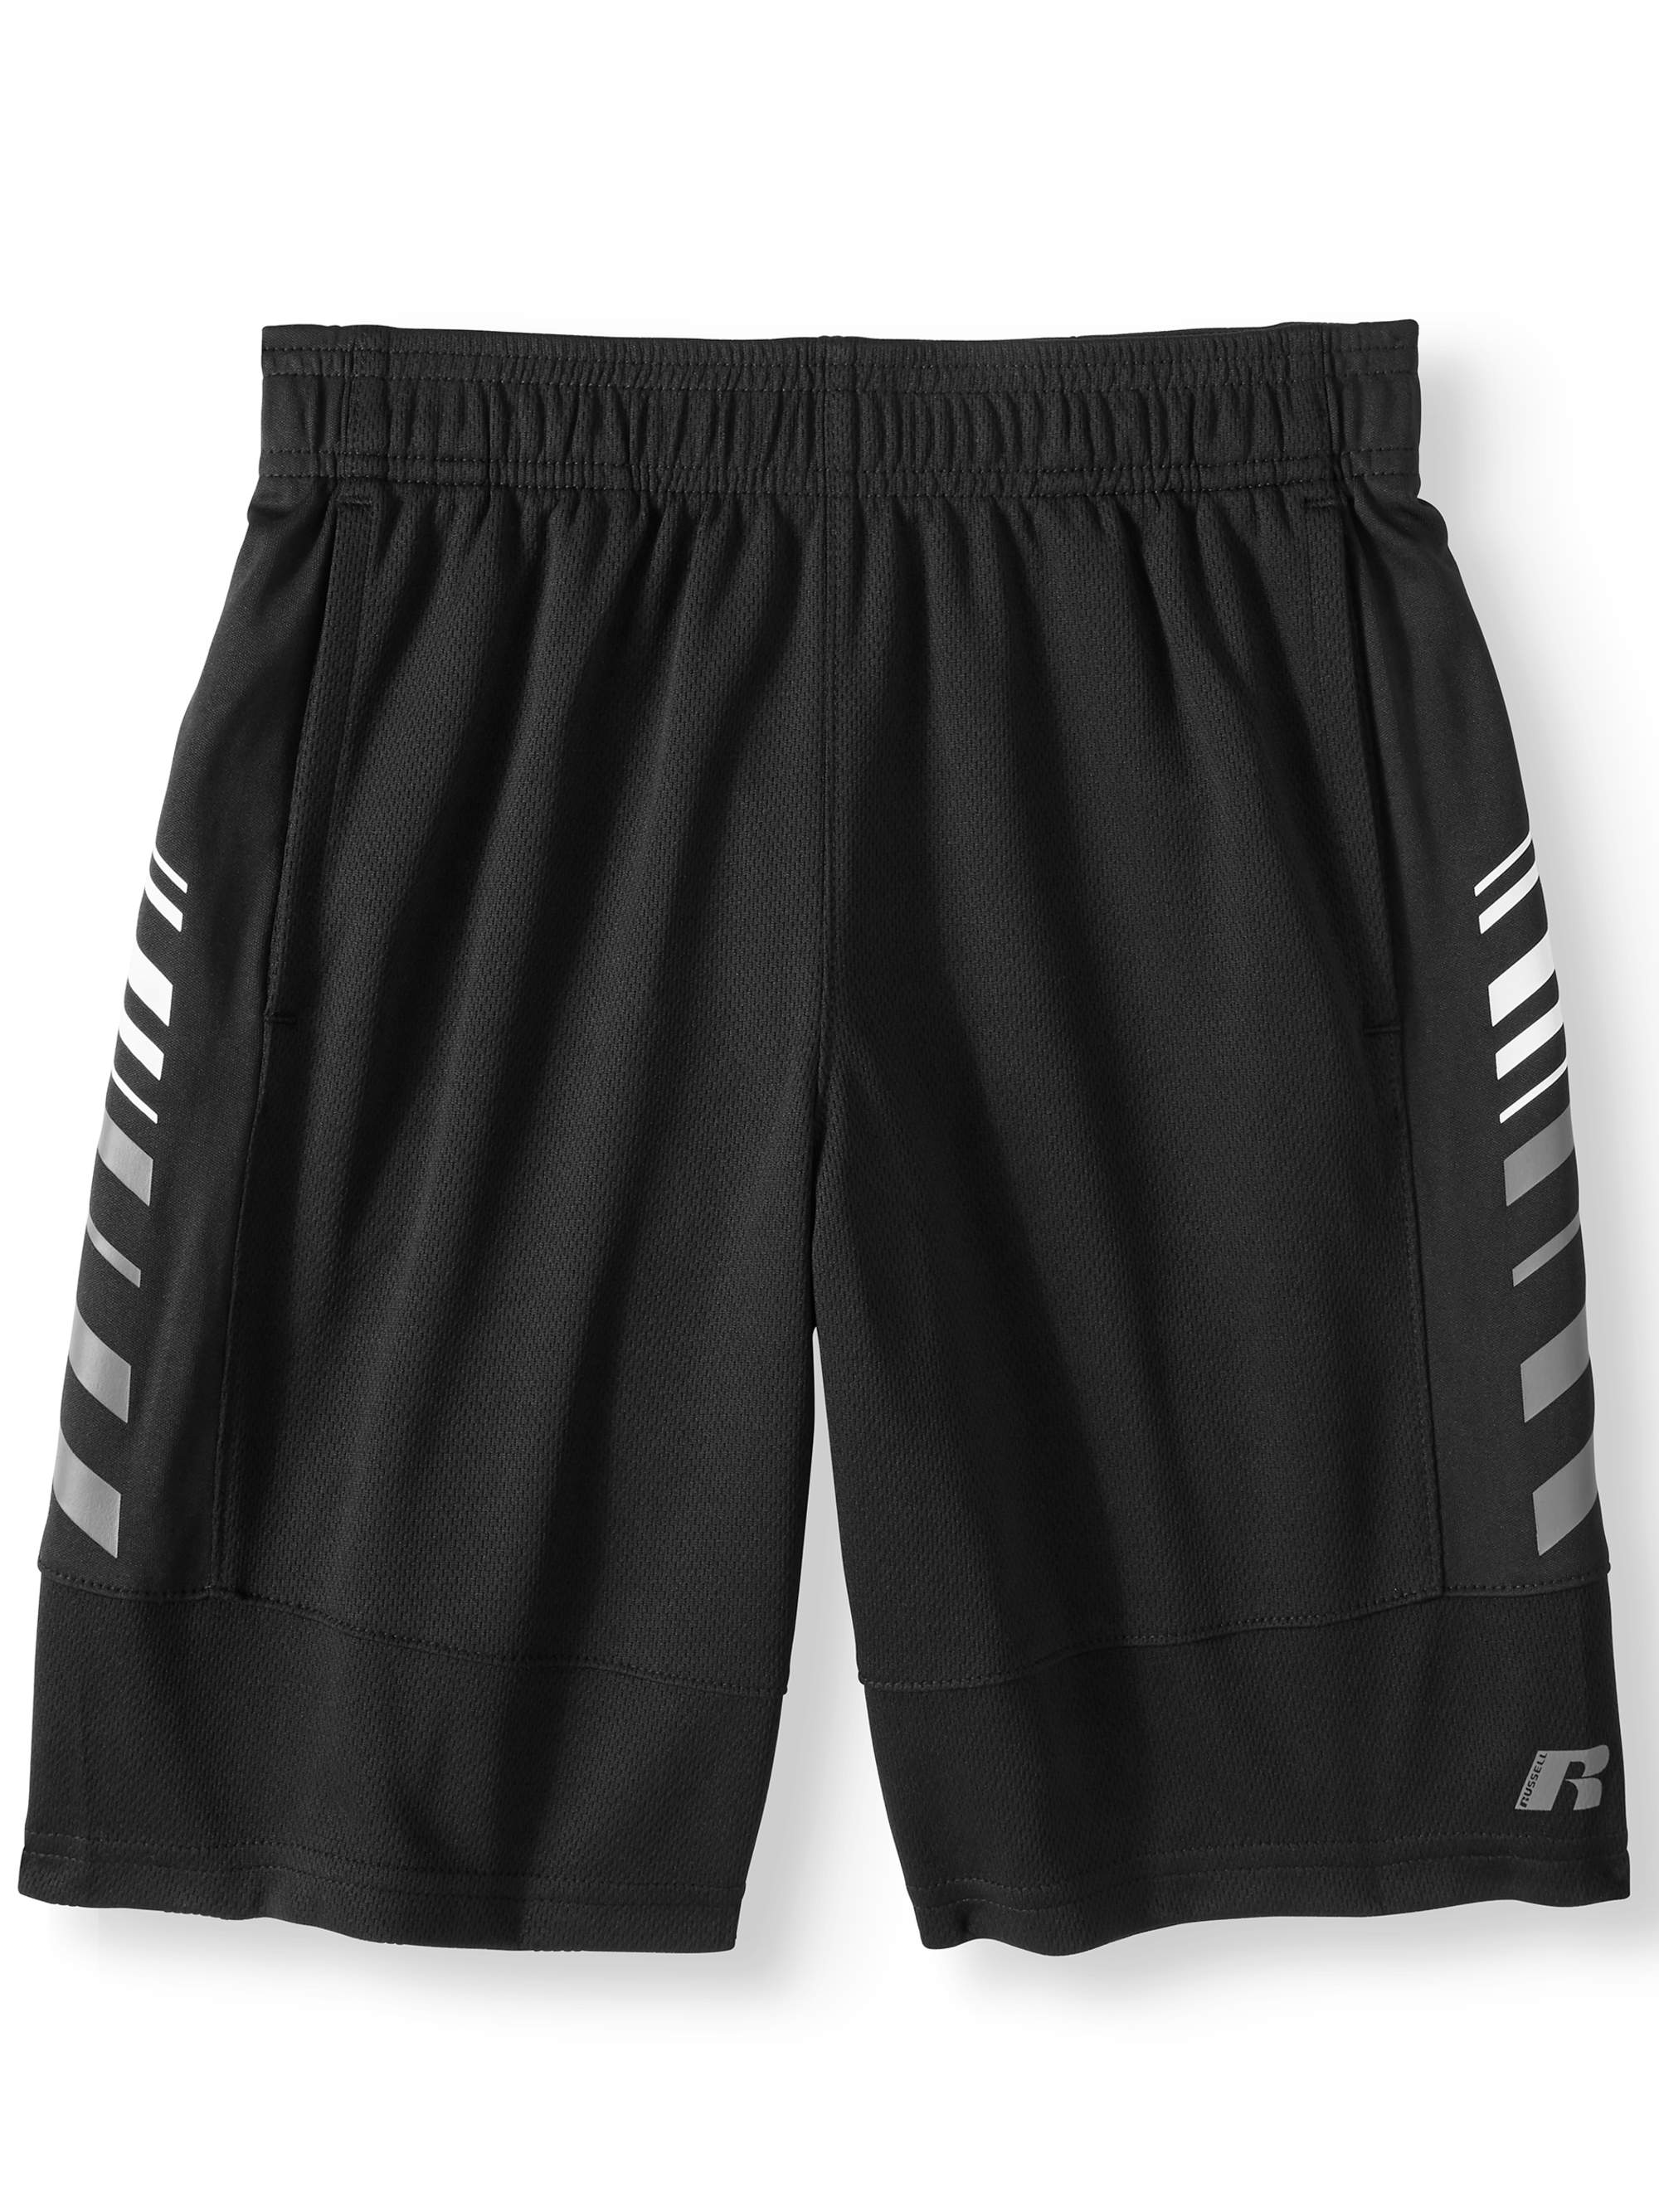 Core Solid Shorts (Little Boys & Big Boys)